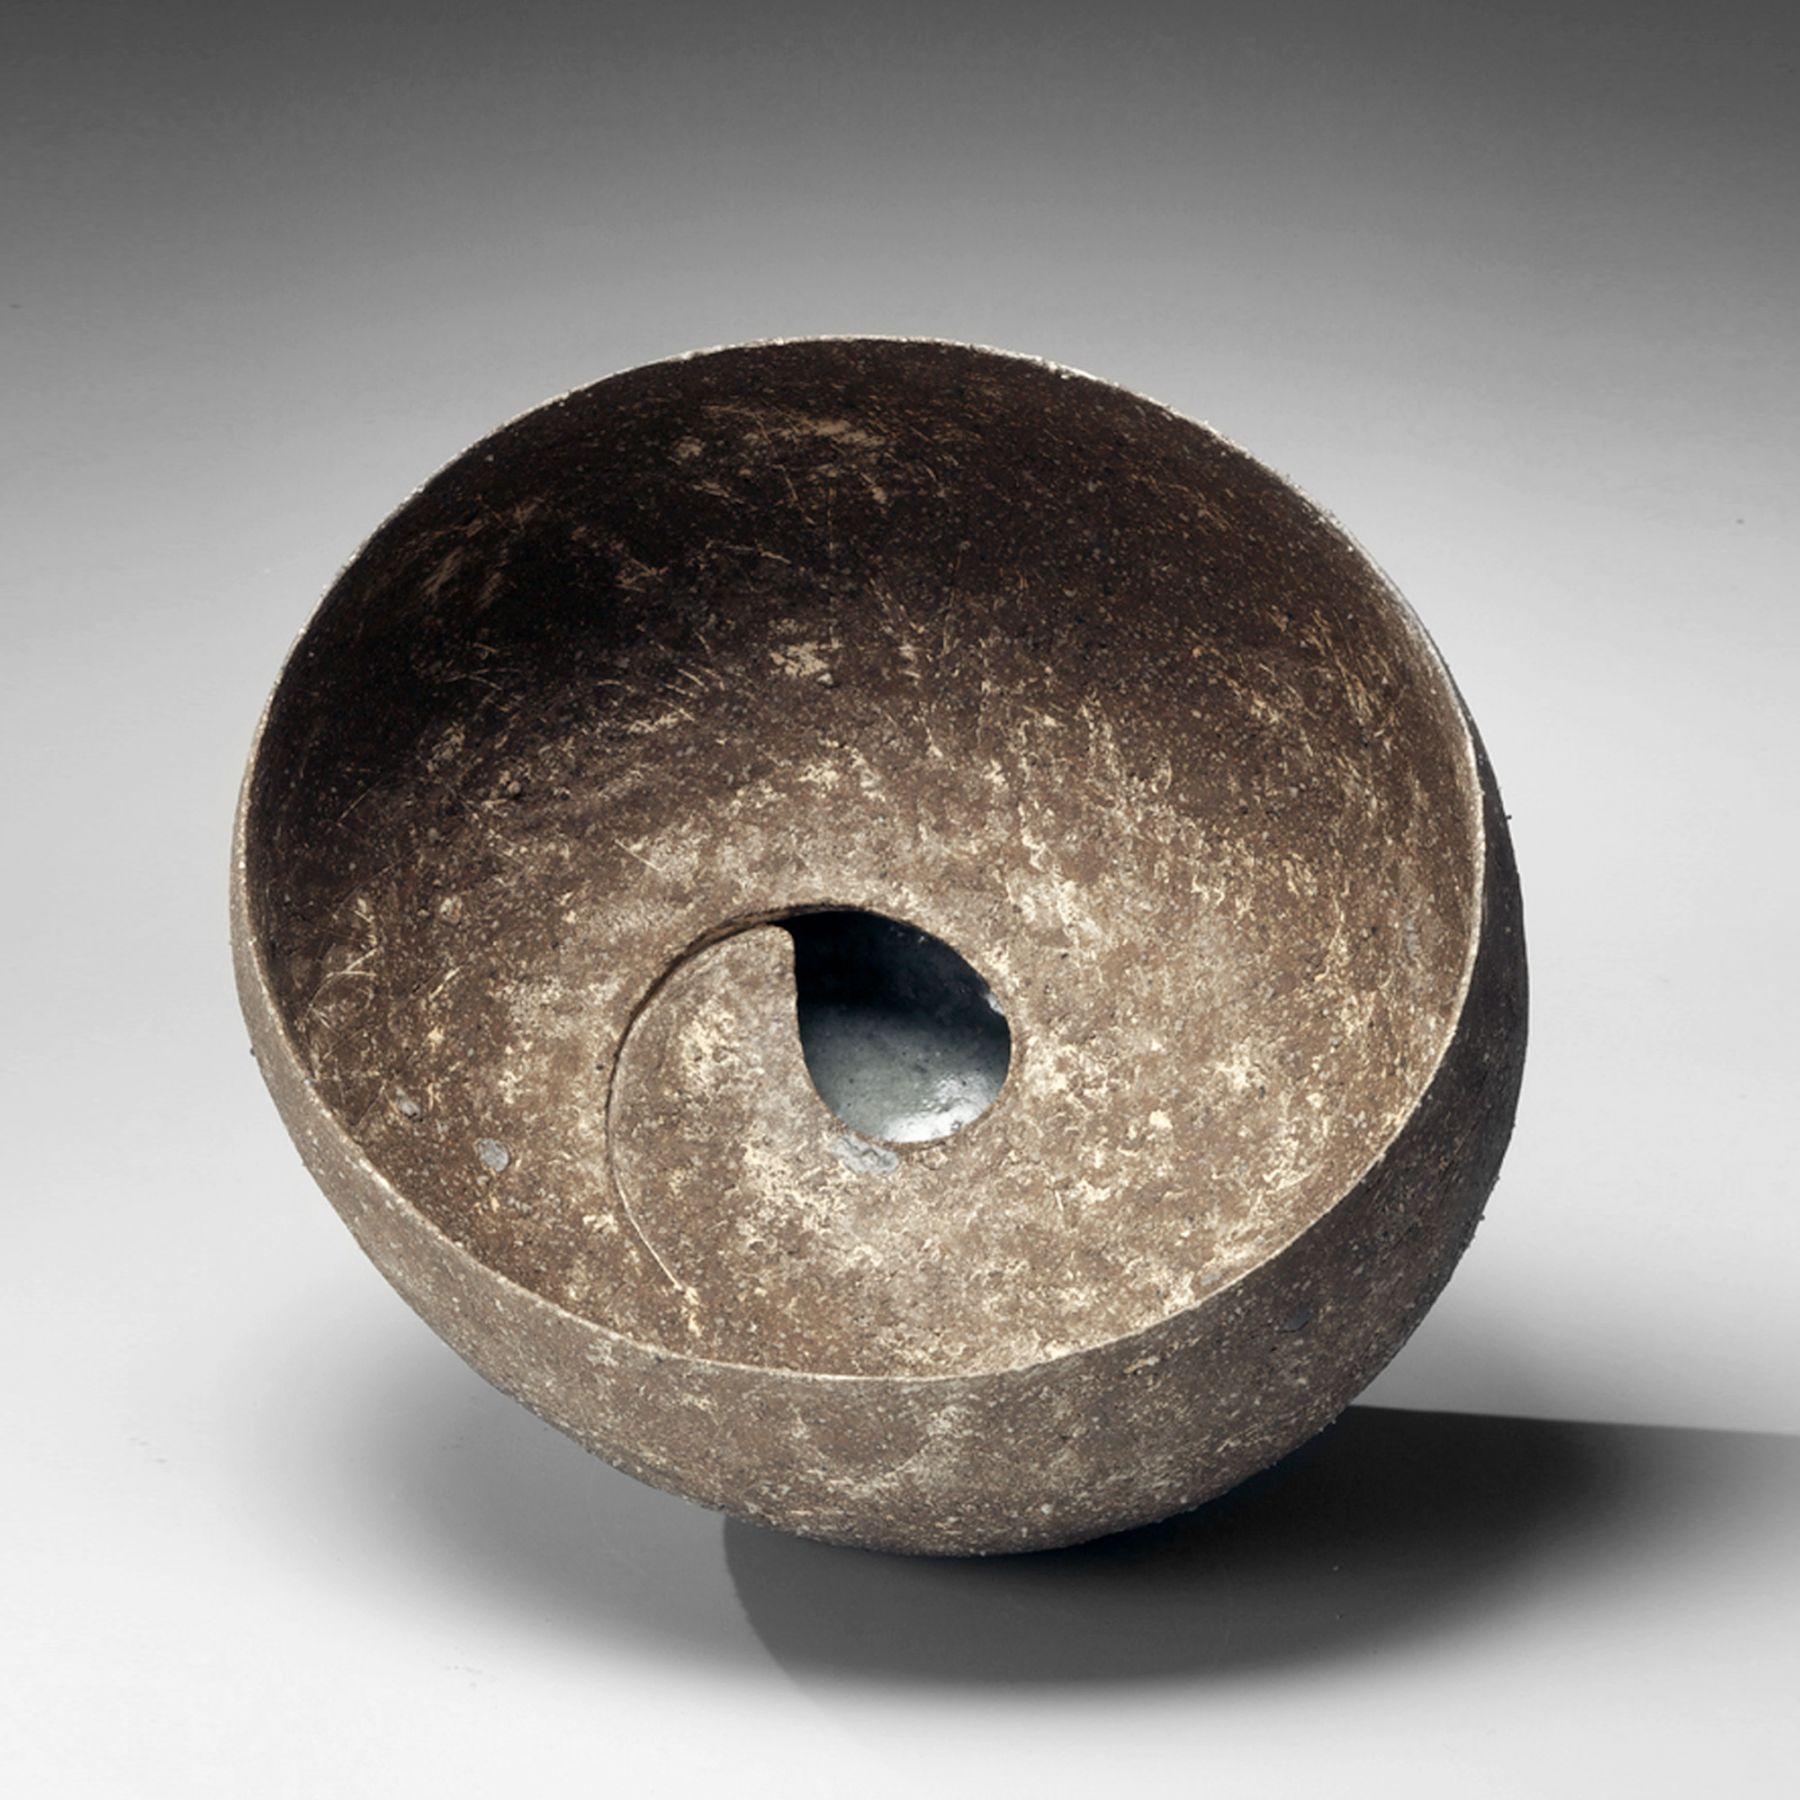 Itō Tadashi (b. 1952), Ocean Mist2012